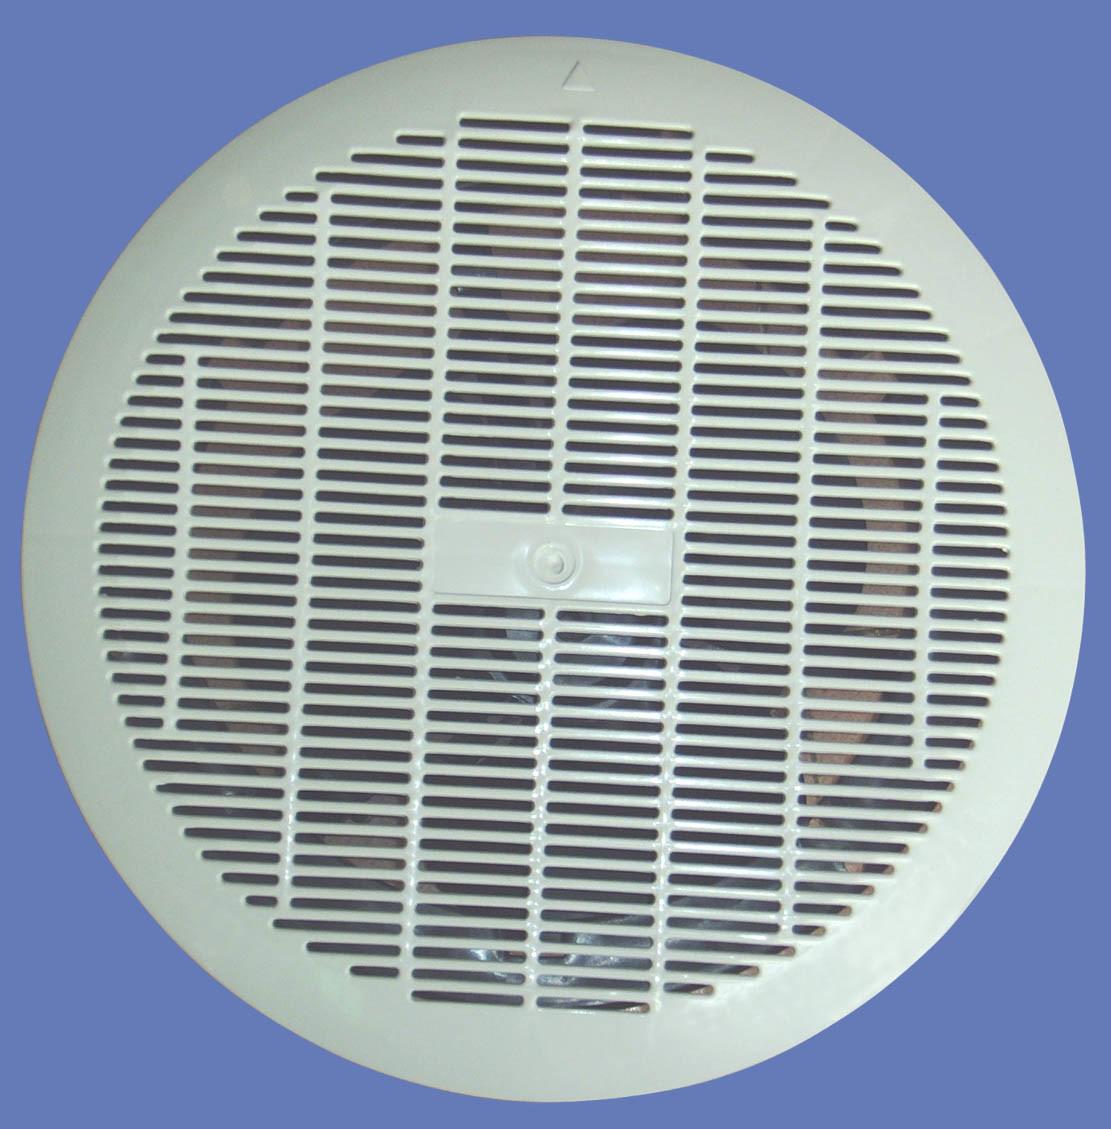 Ceiling Pipe Exhaust/Ventilation Fan (BPT25 20B) #40548B